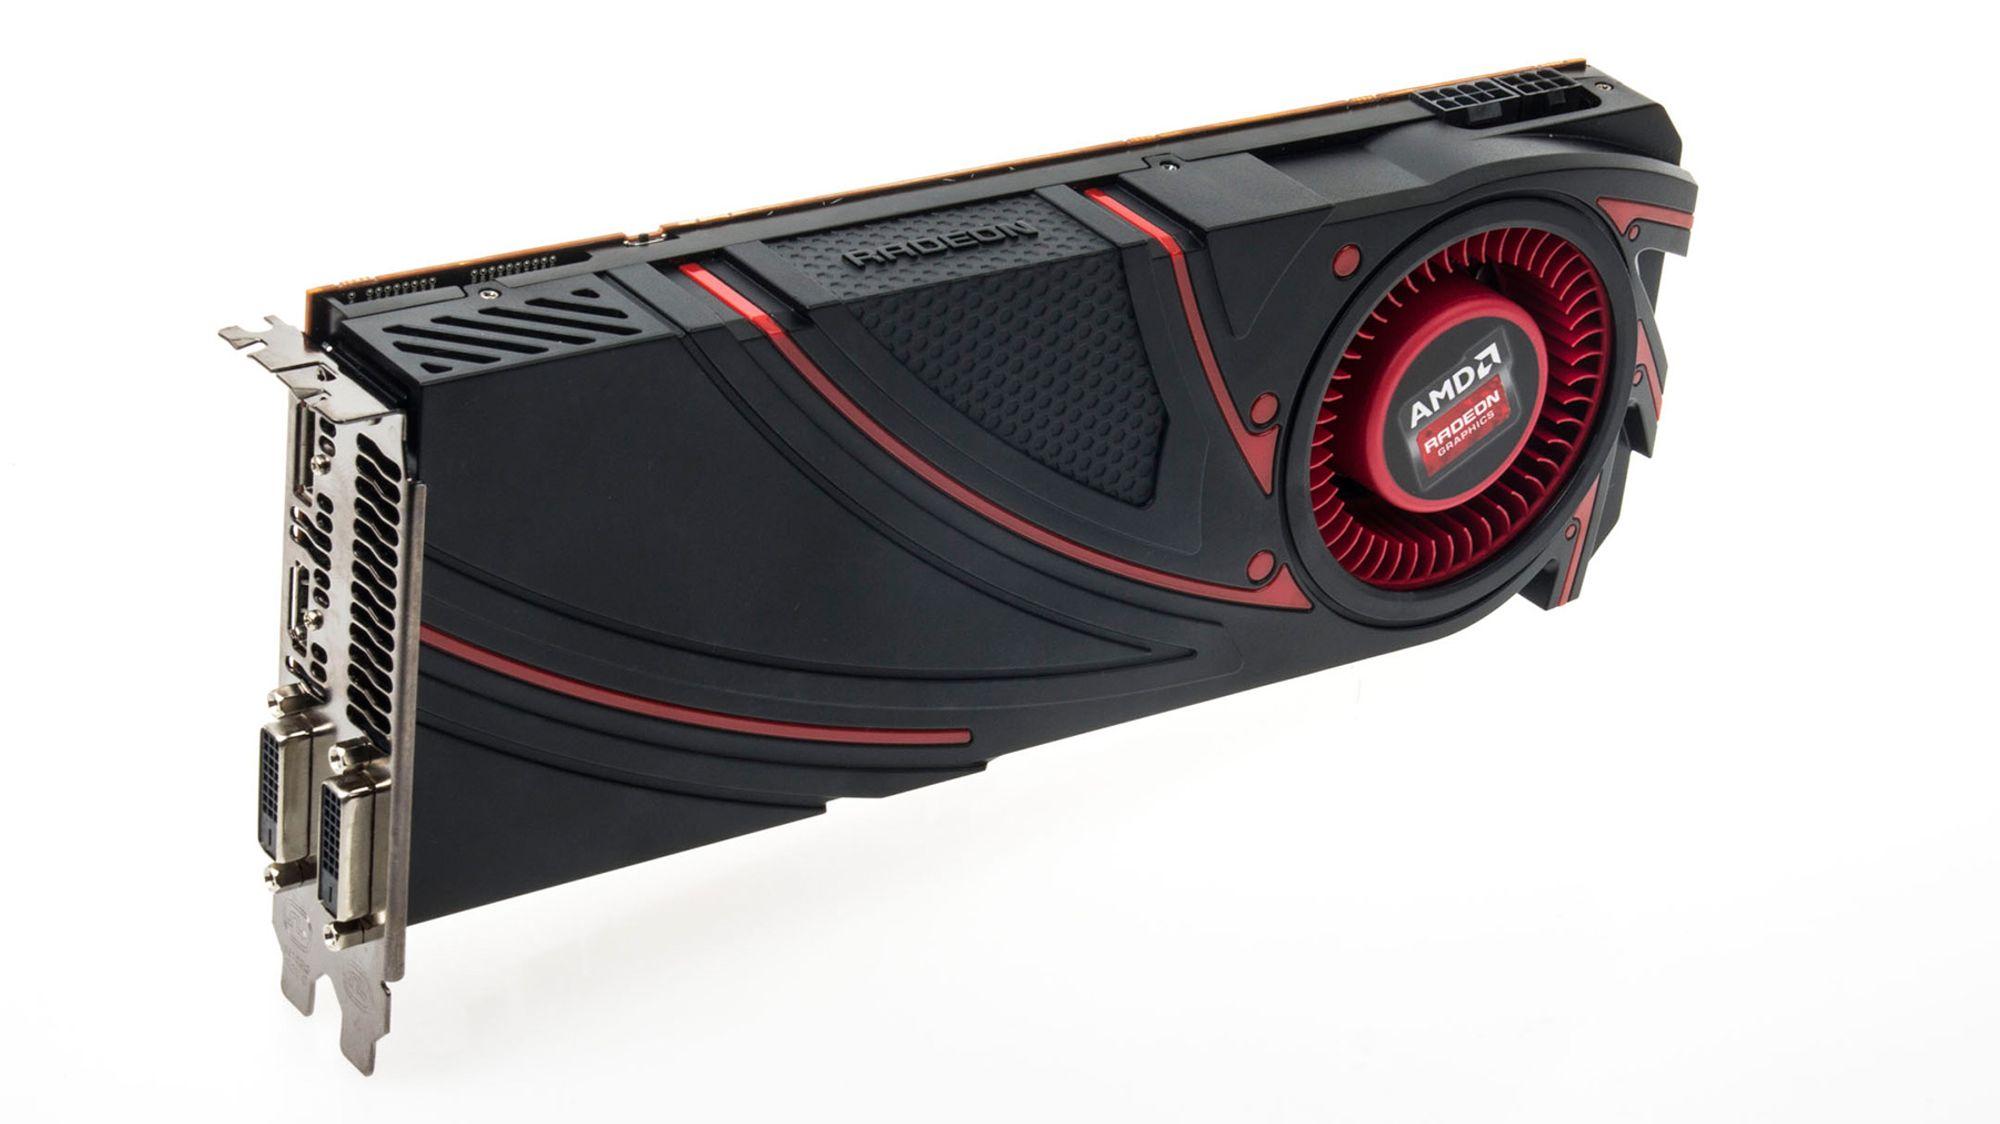 TEST: AMD Radeon R9 290X - Tek.no